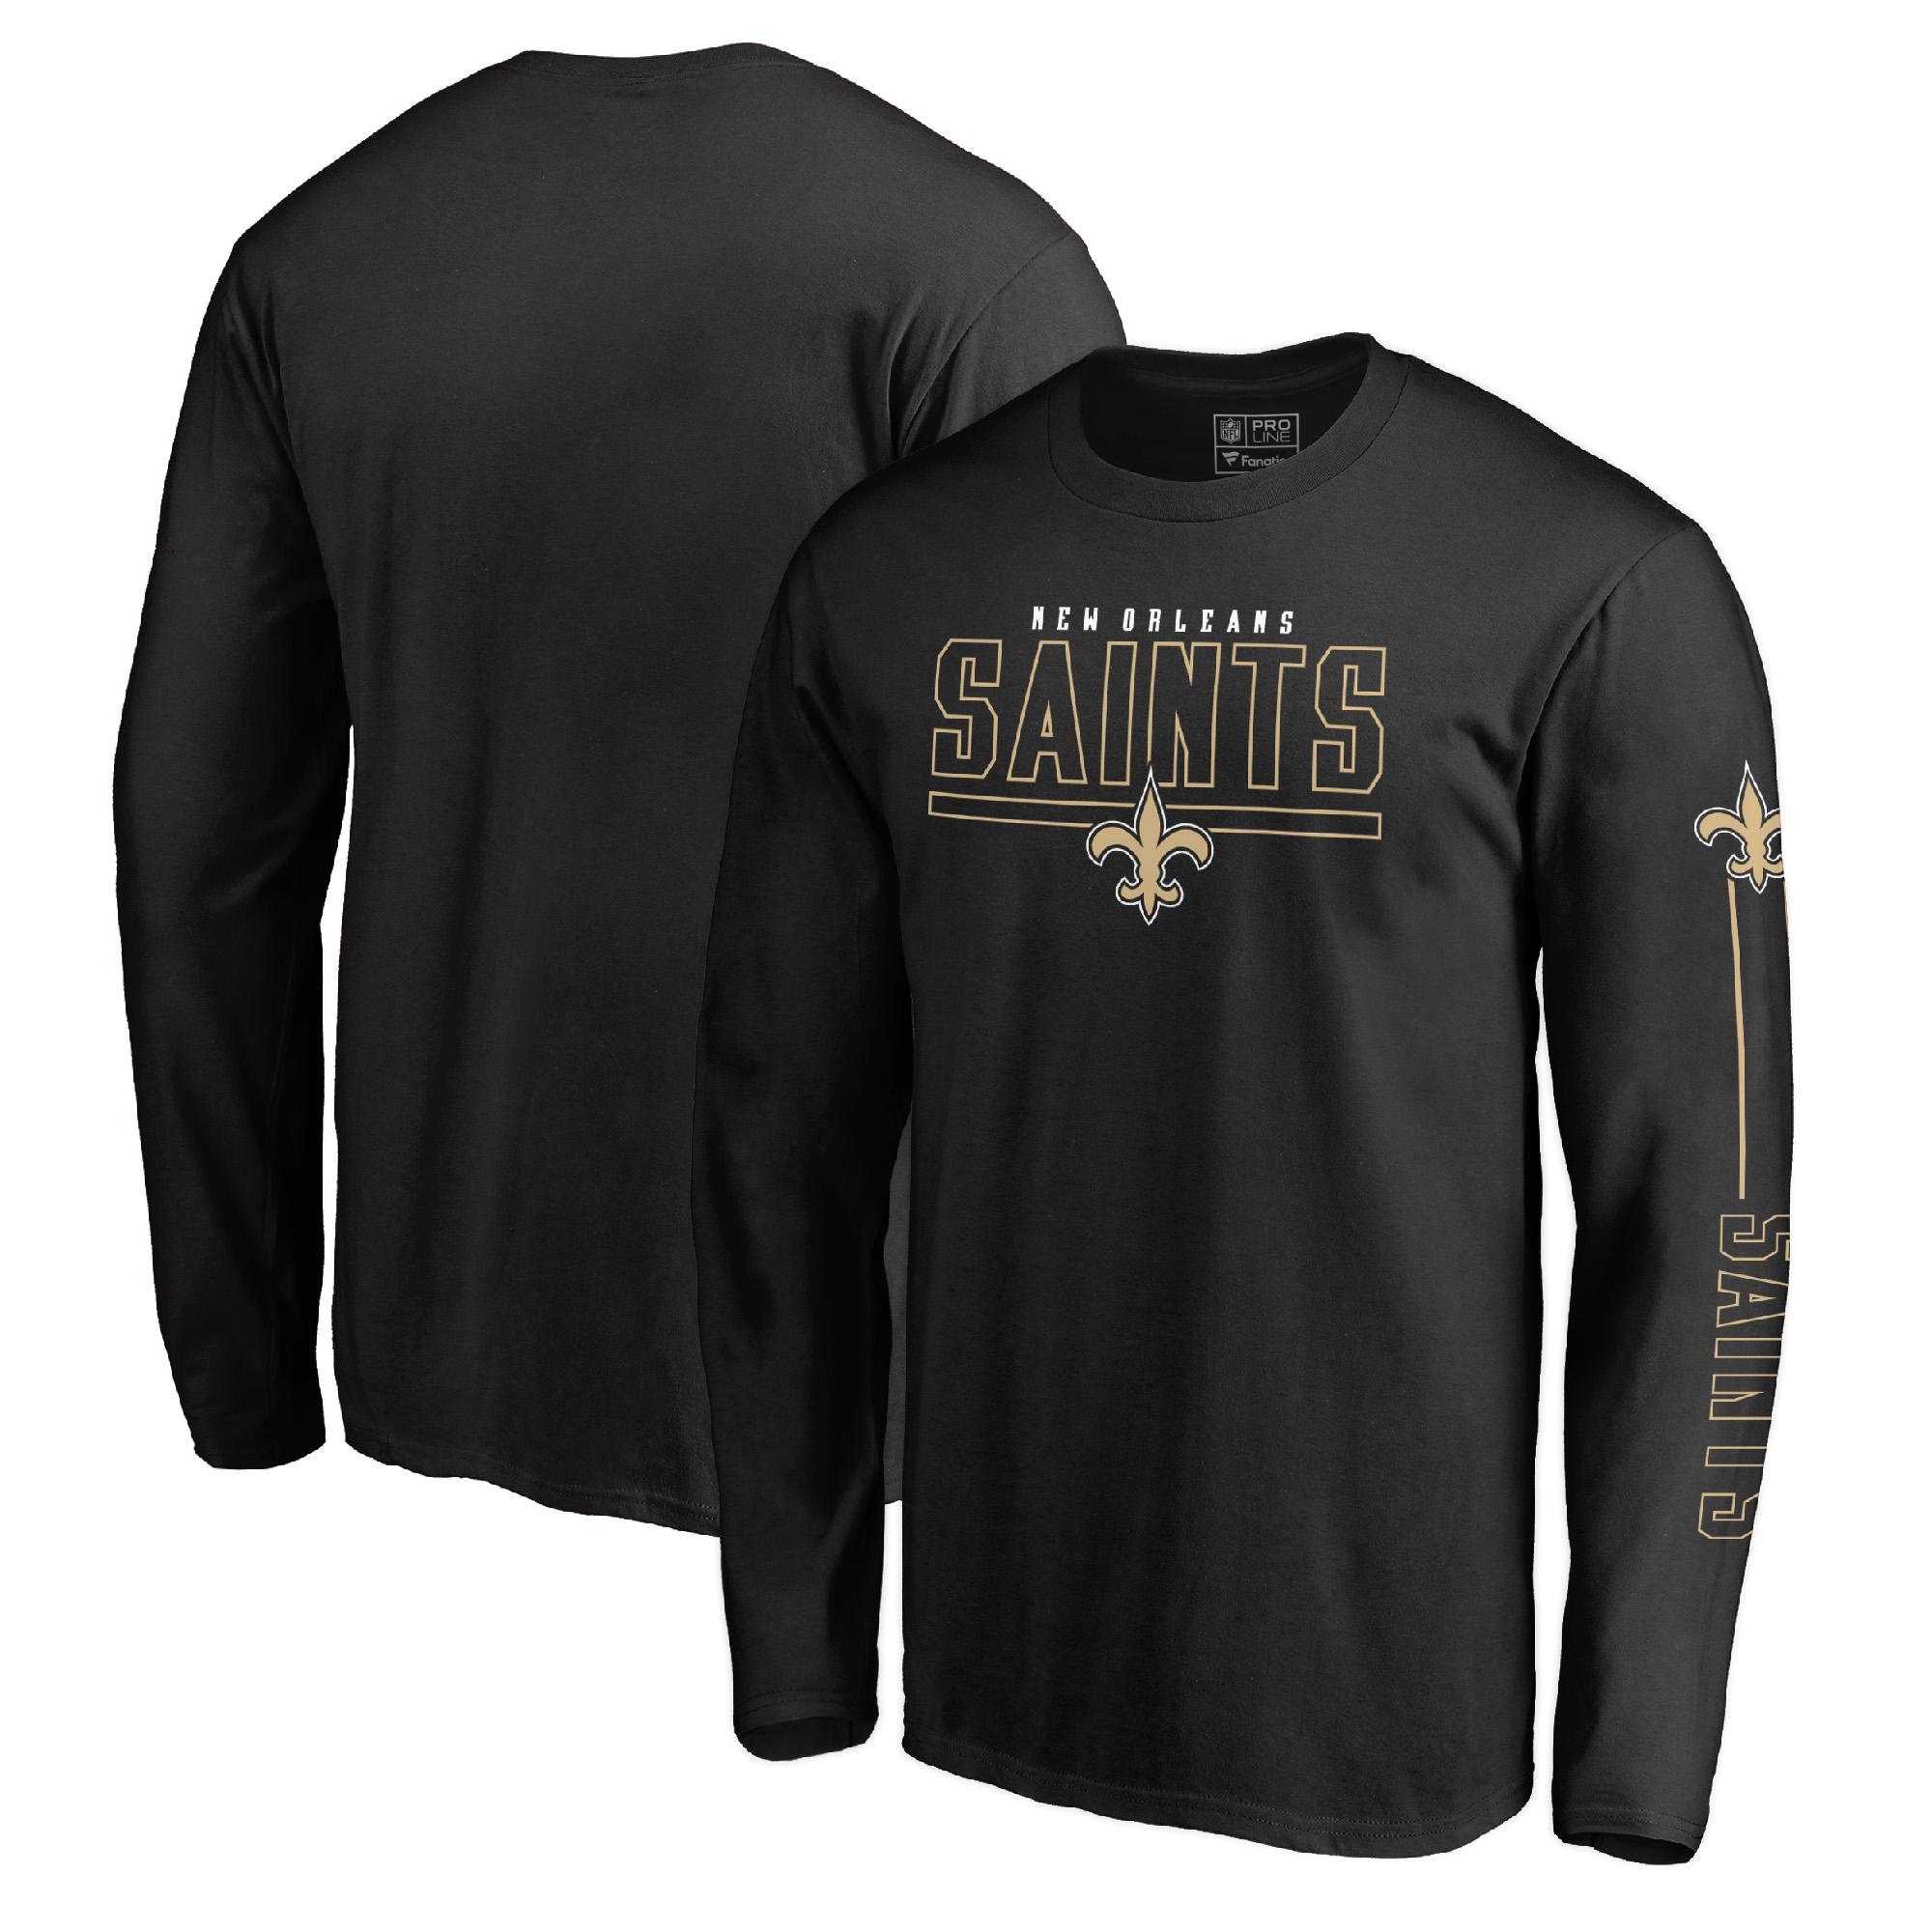 New Orleans Saints NFL Pro Line by Fanatics Branded Front Line Long Sleeve T-Shirt - Black